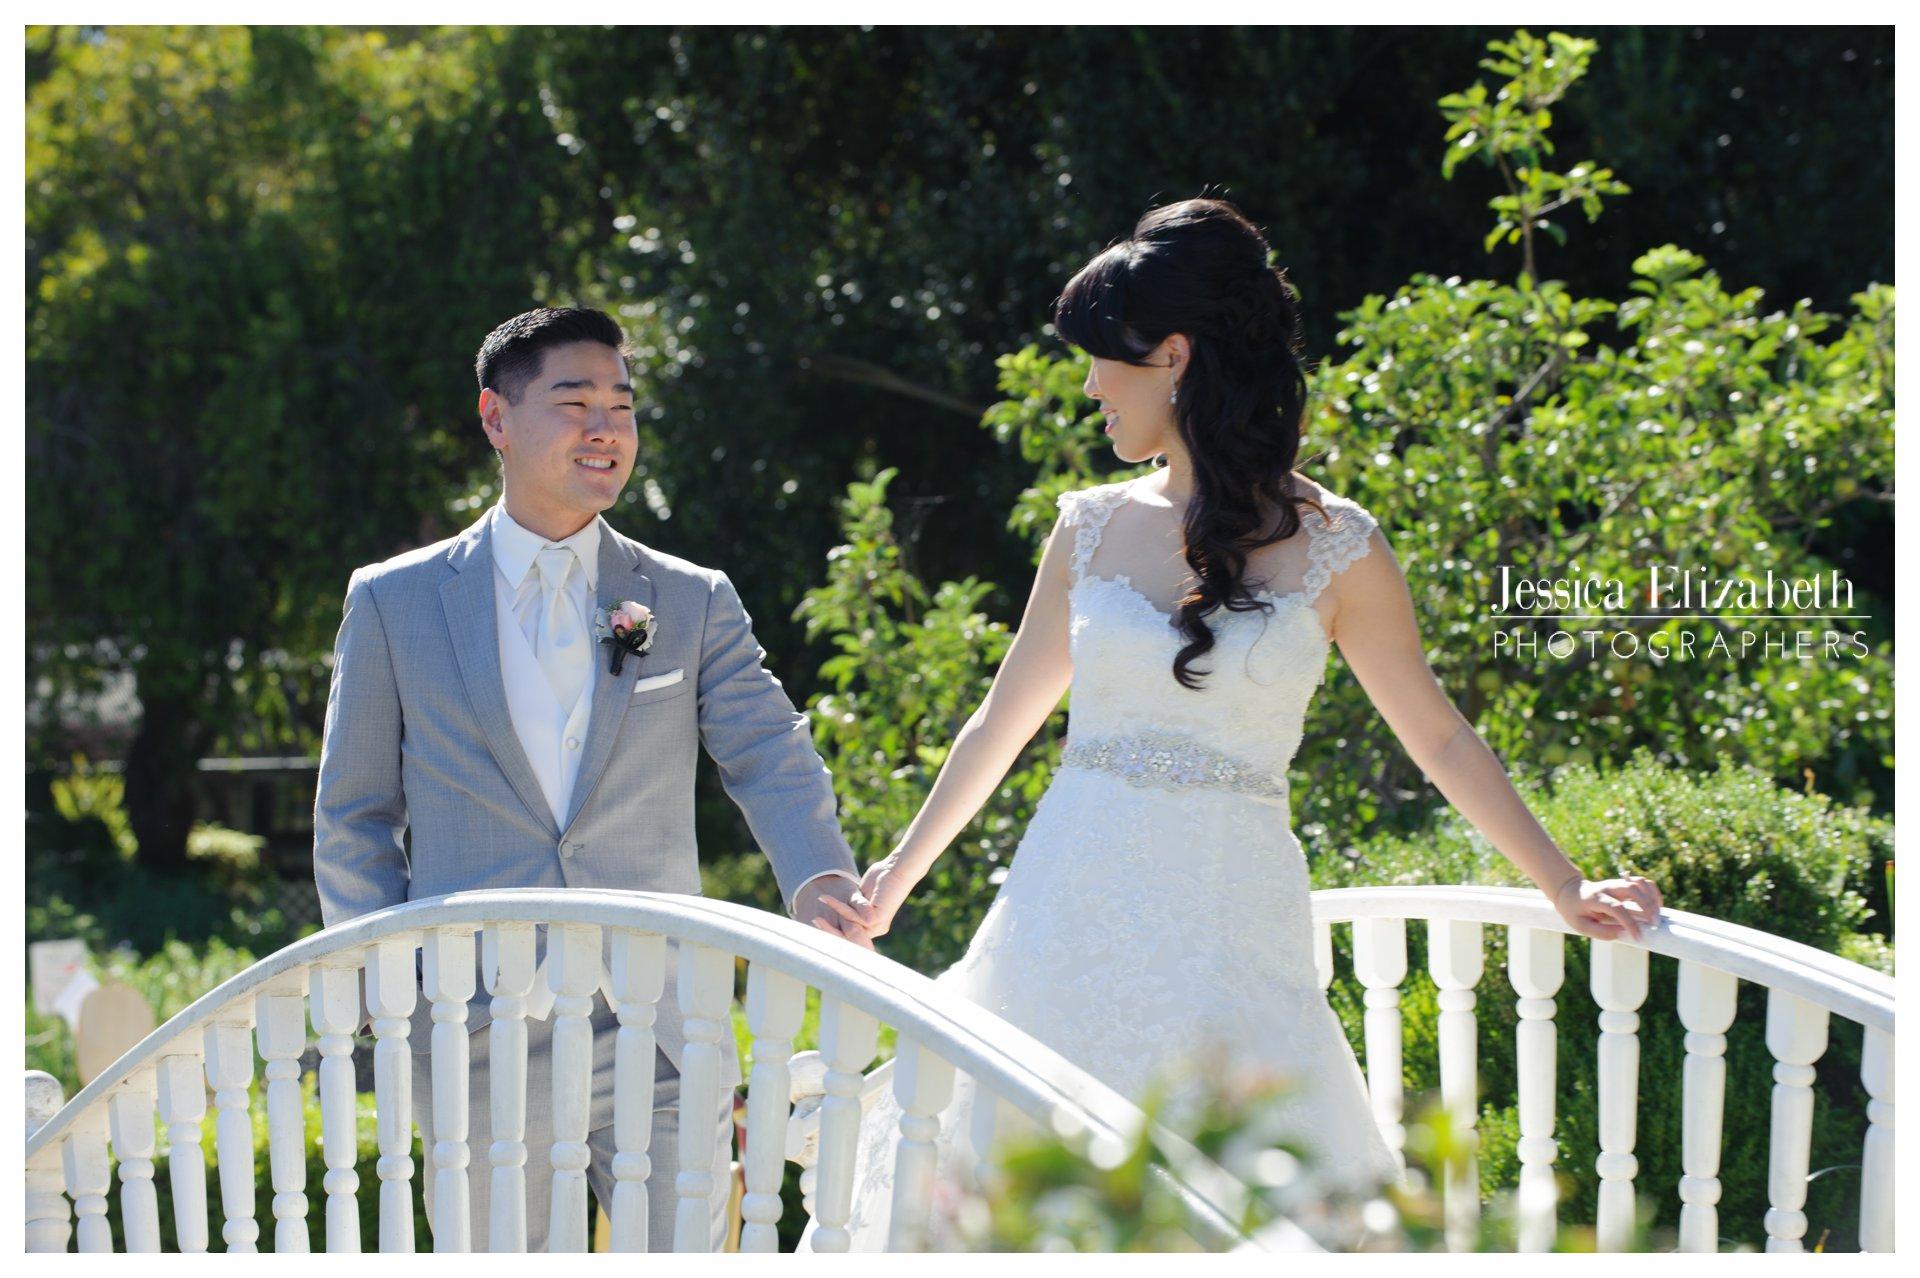 13-South Coast Botanic Garden Palos Verdes Wedding Photography by Jessica Elizabeth